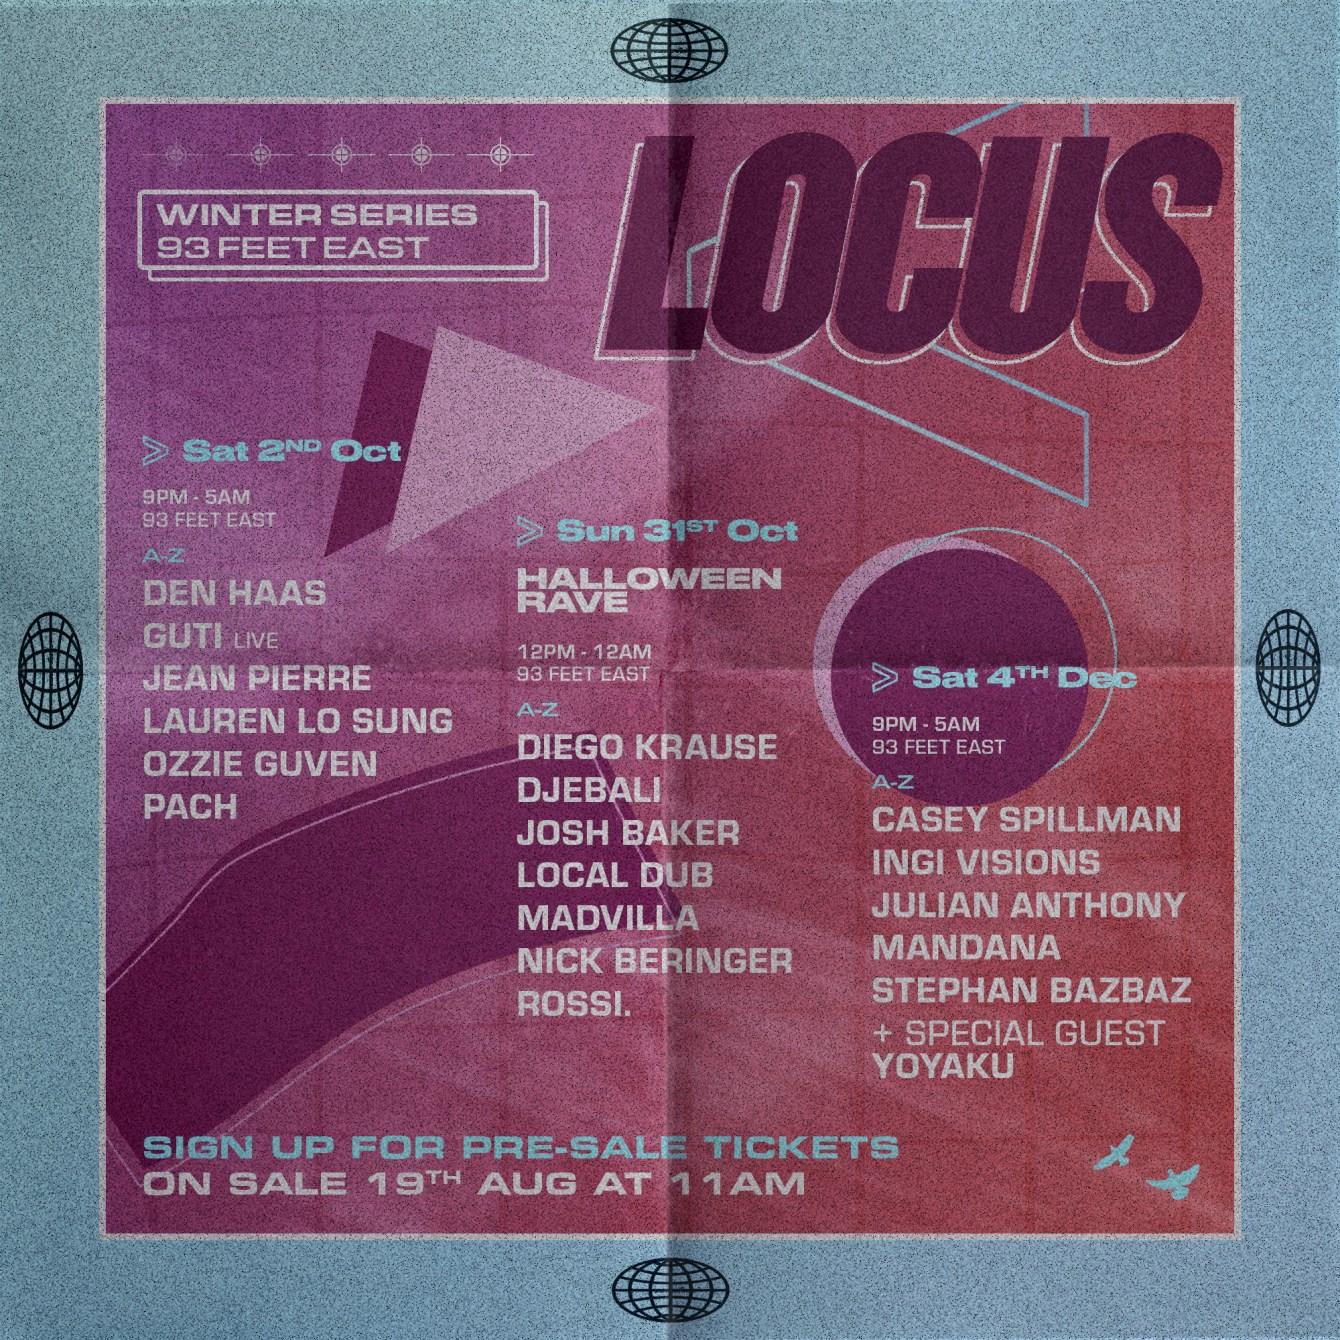 LOCUS: Halloween Rave - Flyer back